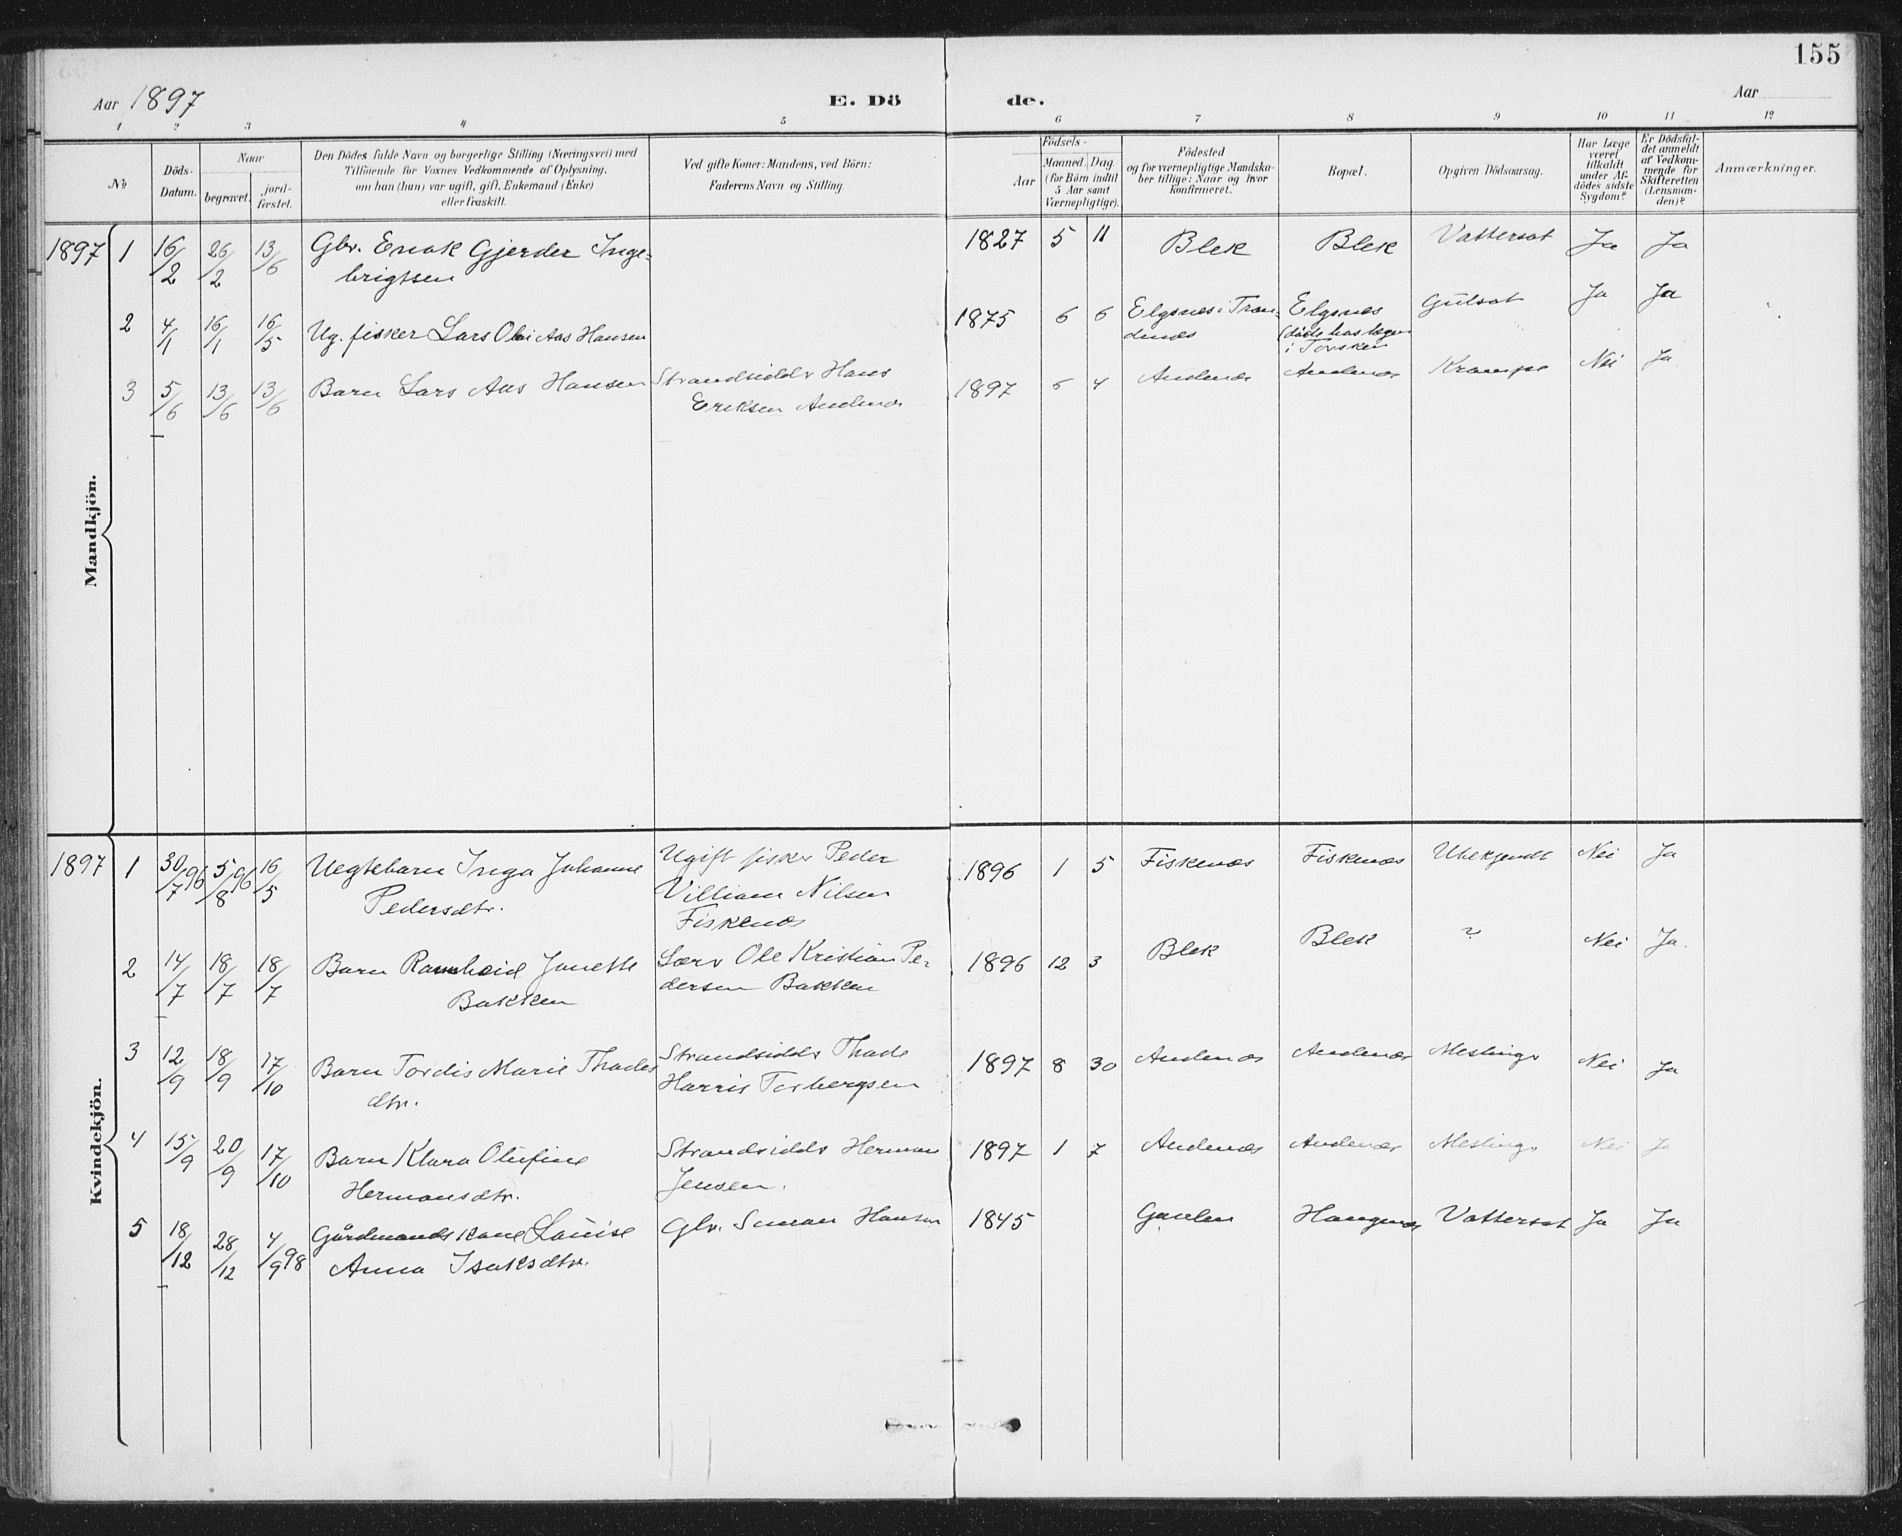 SAT, Ministerialprotokoller, klokkerbøker og fødselsregistre - Nordland, 899/L1437: Ministerialbok nr. 899A05, 1897-1908, s. 155